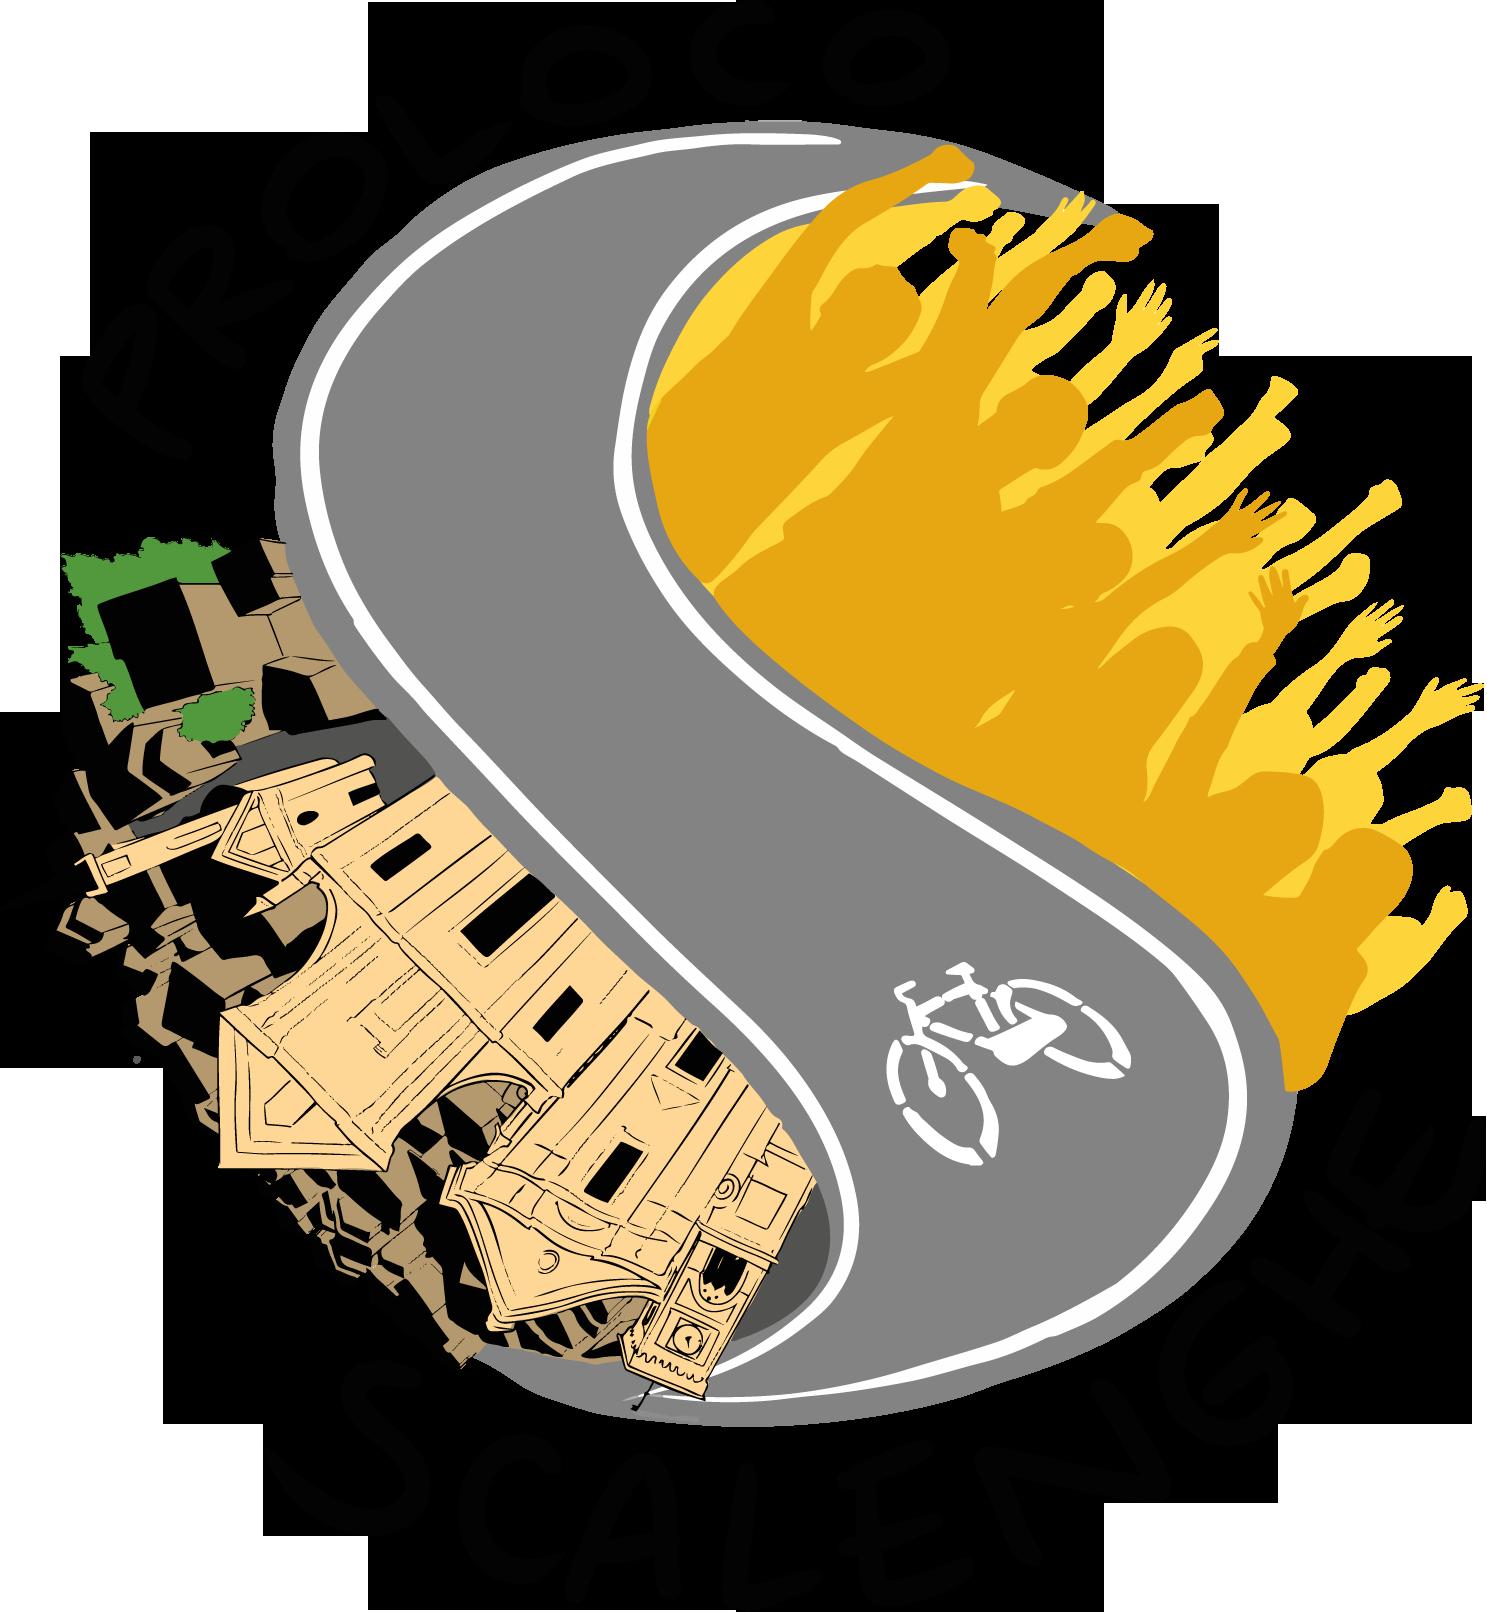 Logo proloco scalenghe